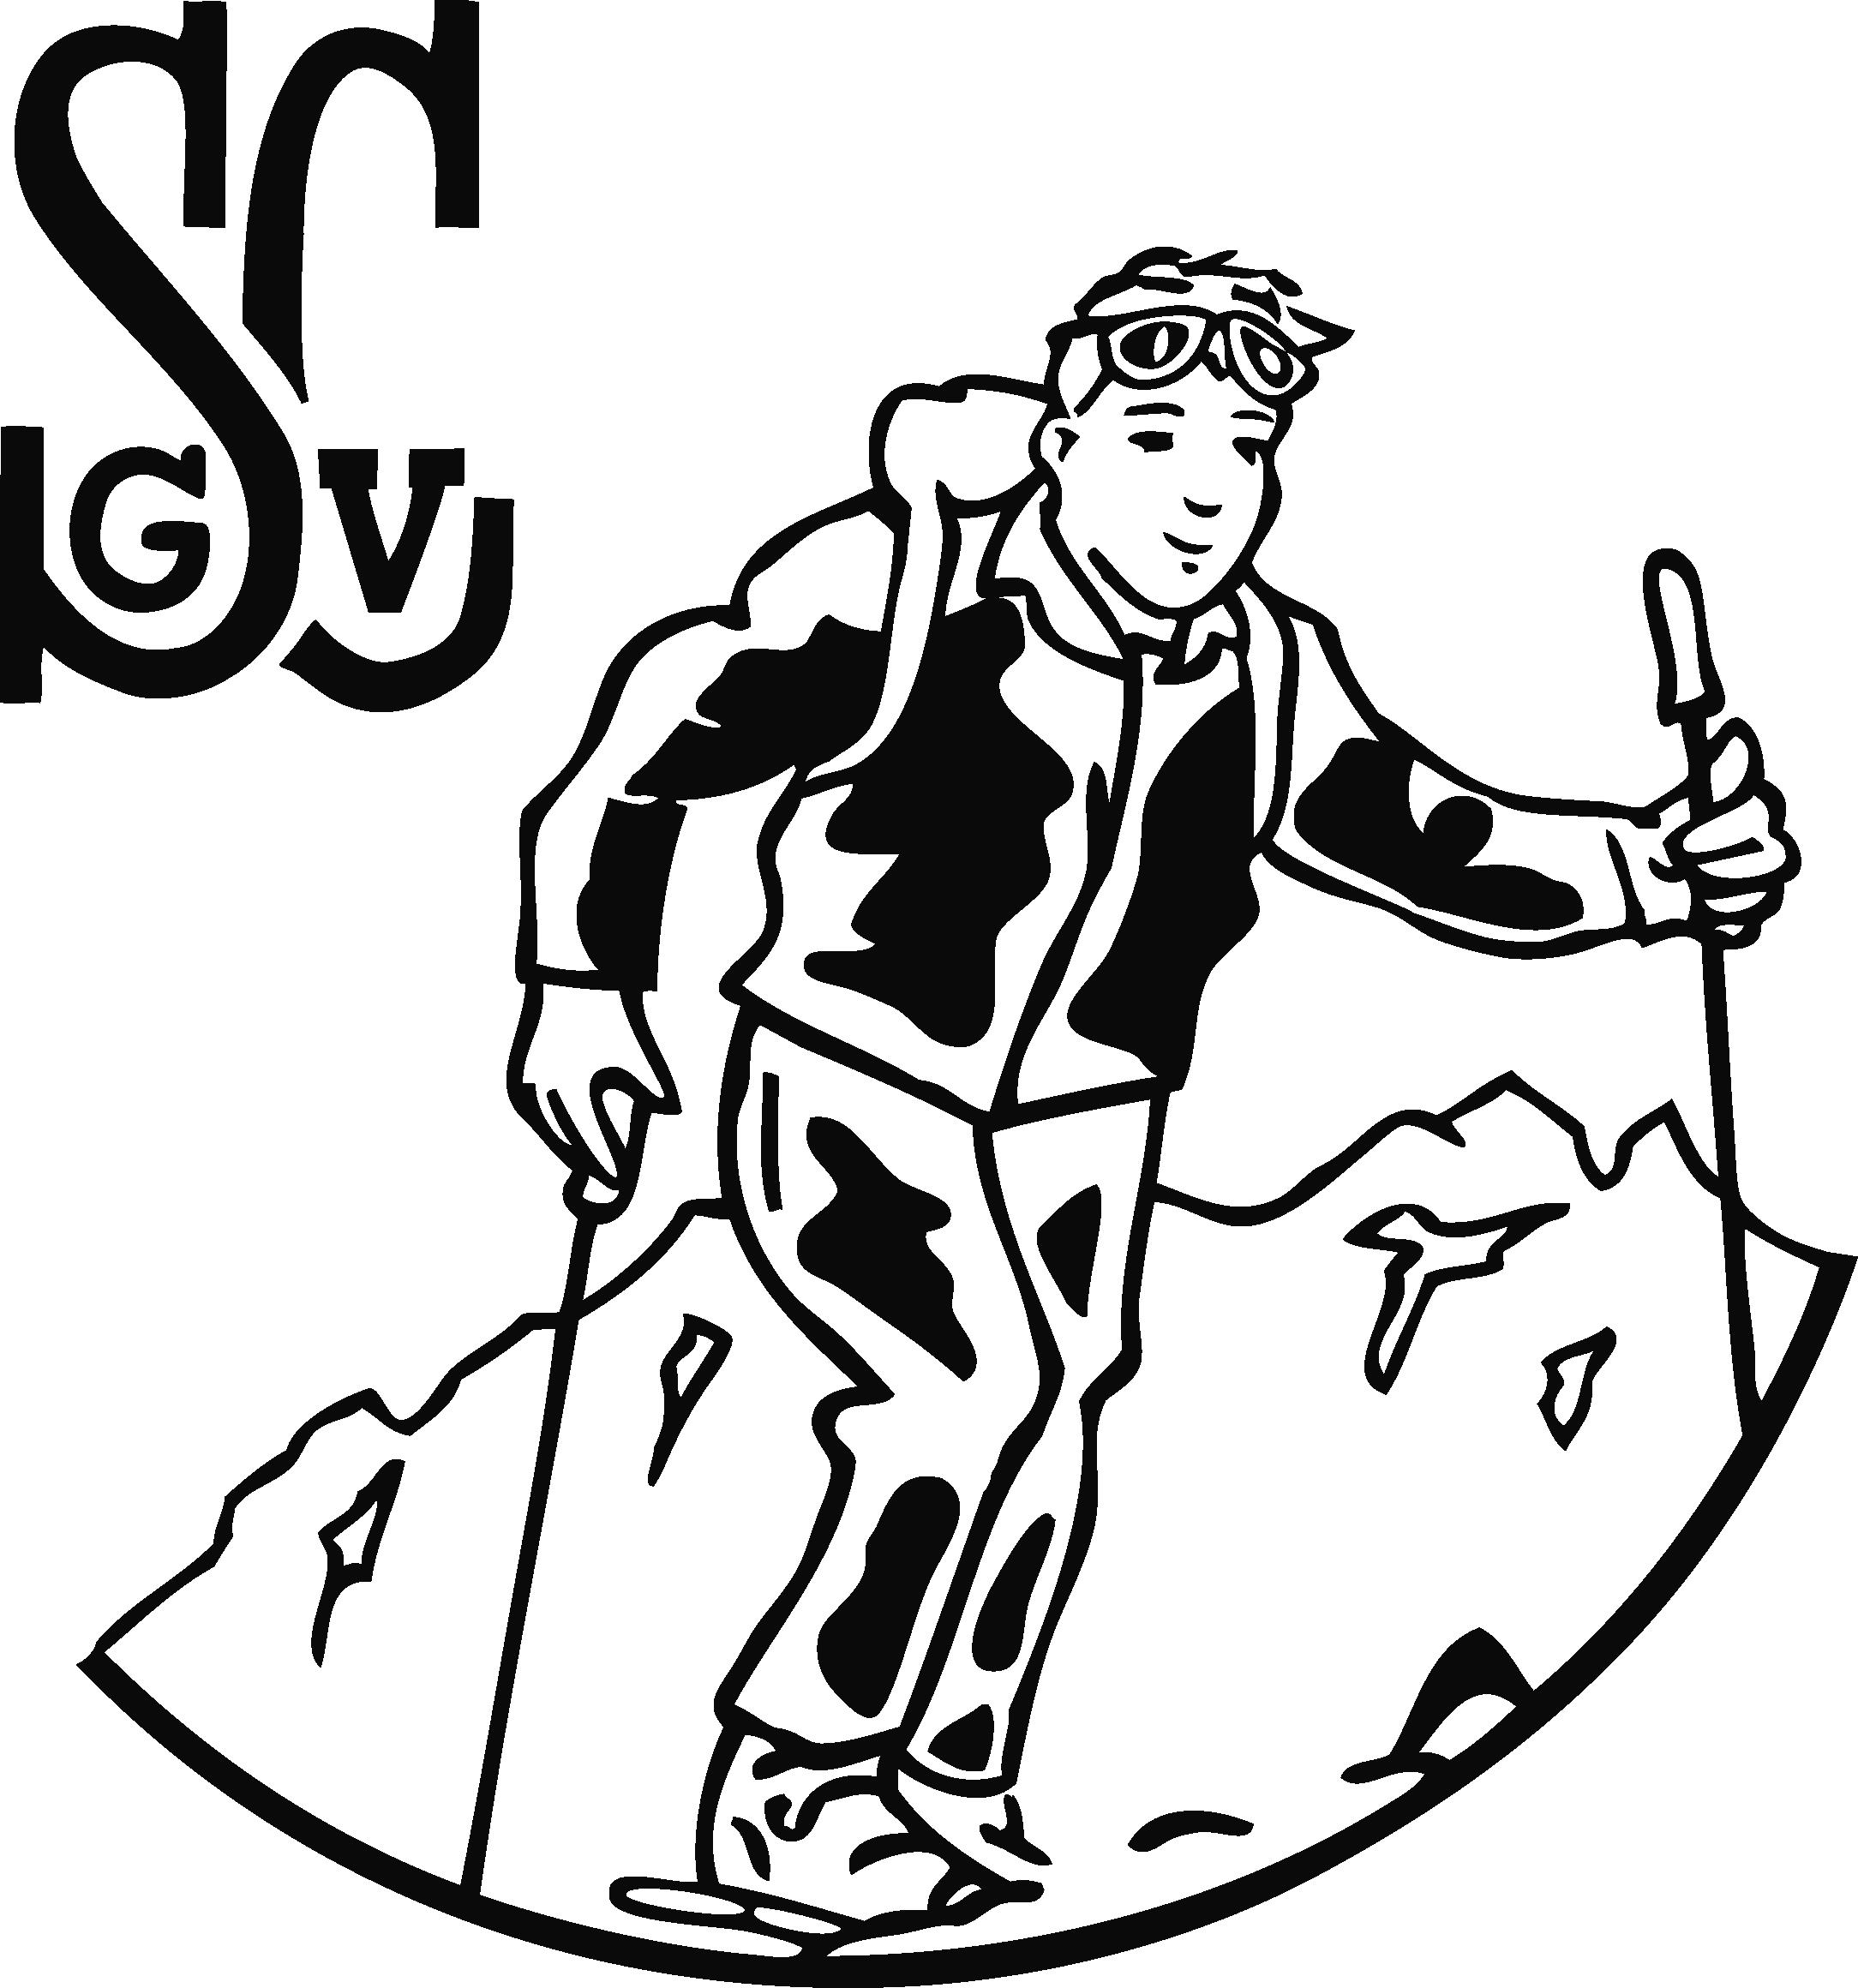 Ski-Club Gendarmerie Vaudoise